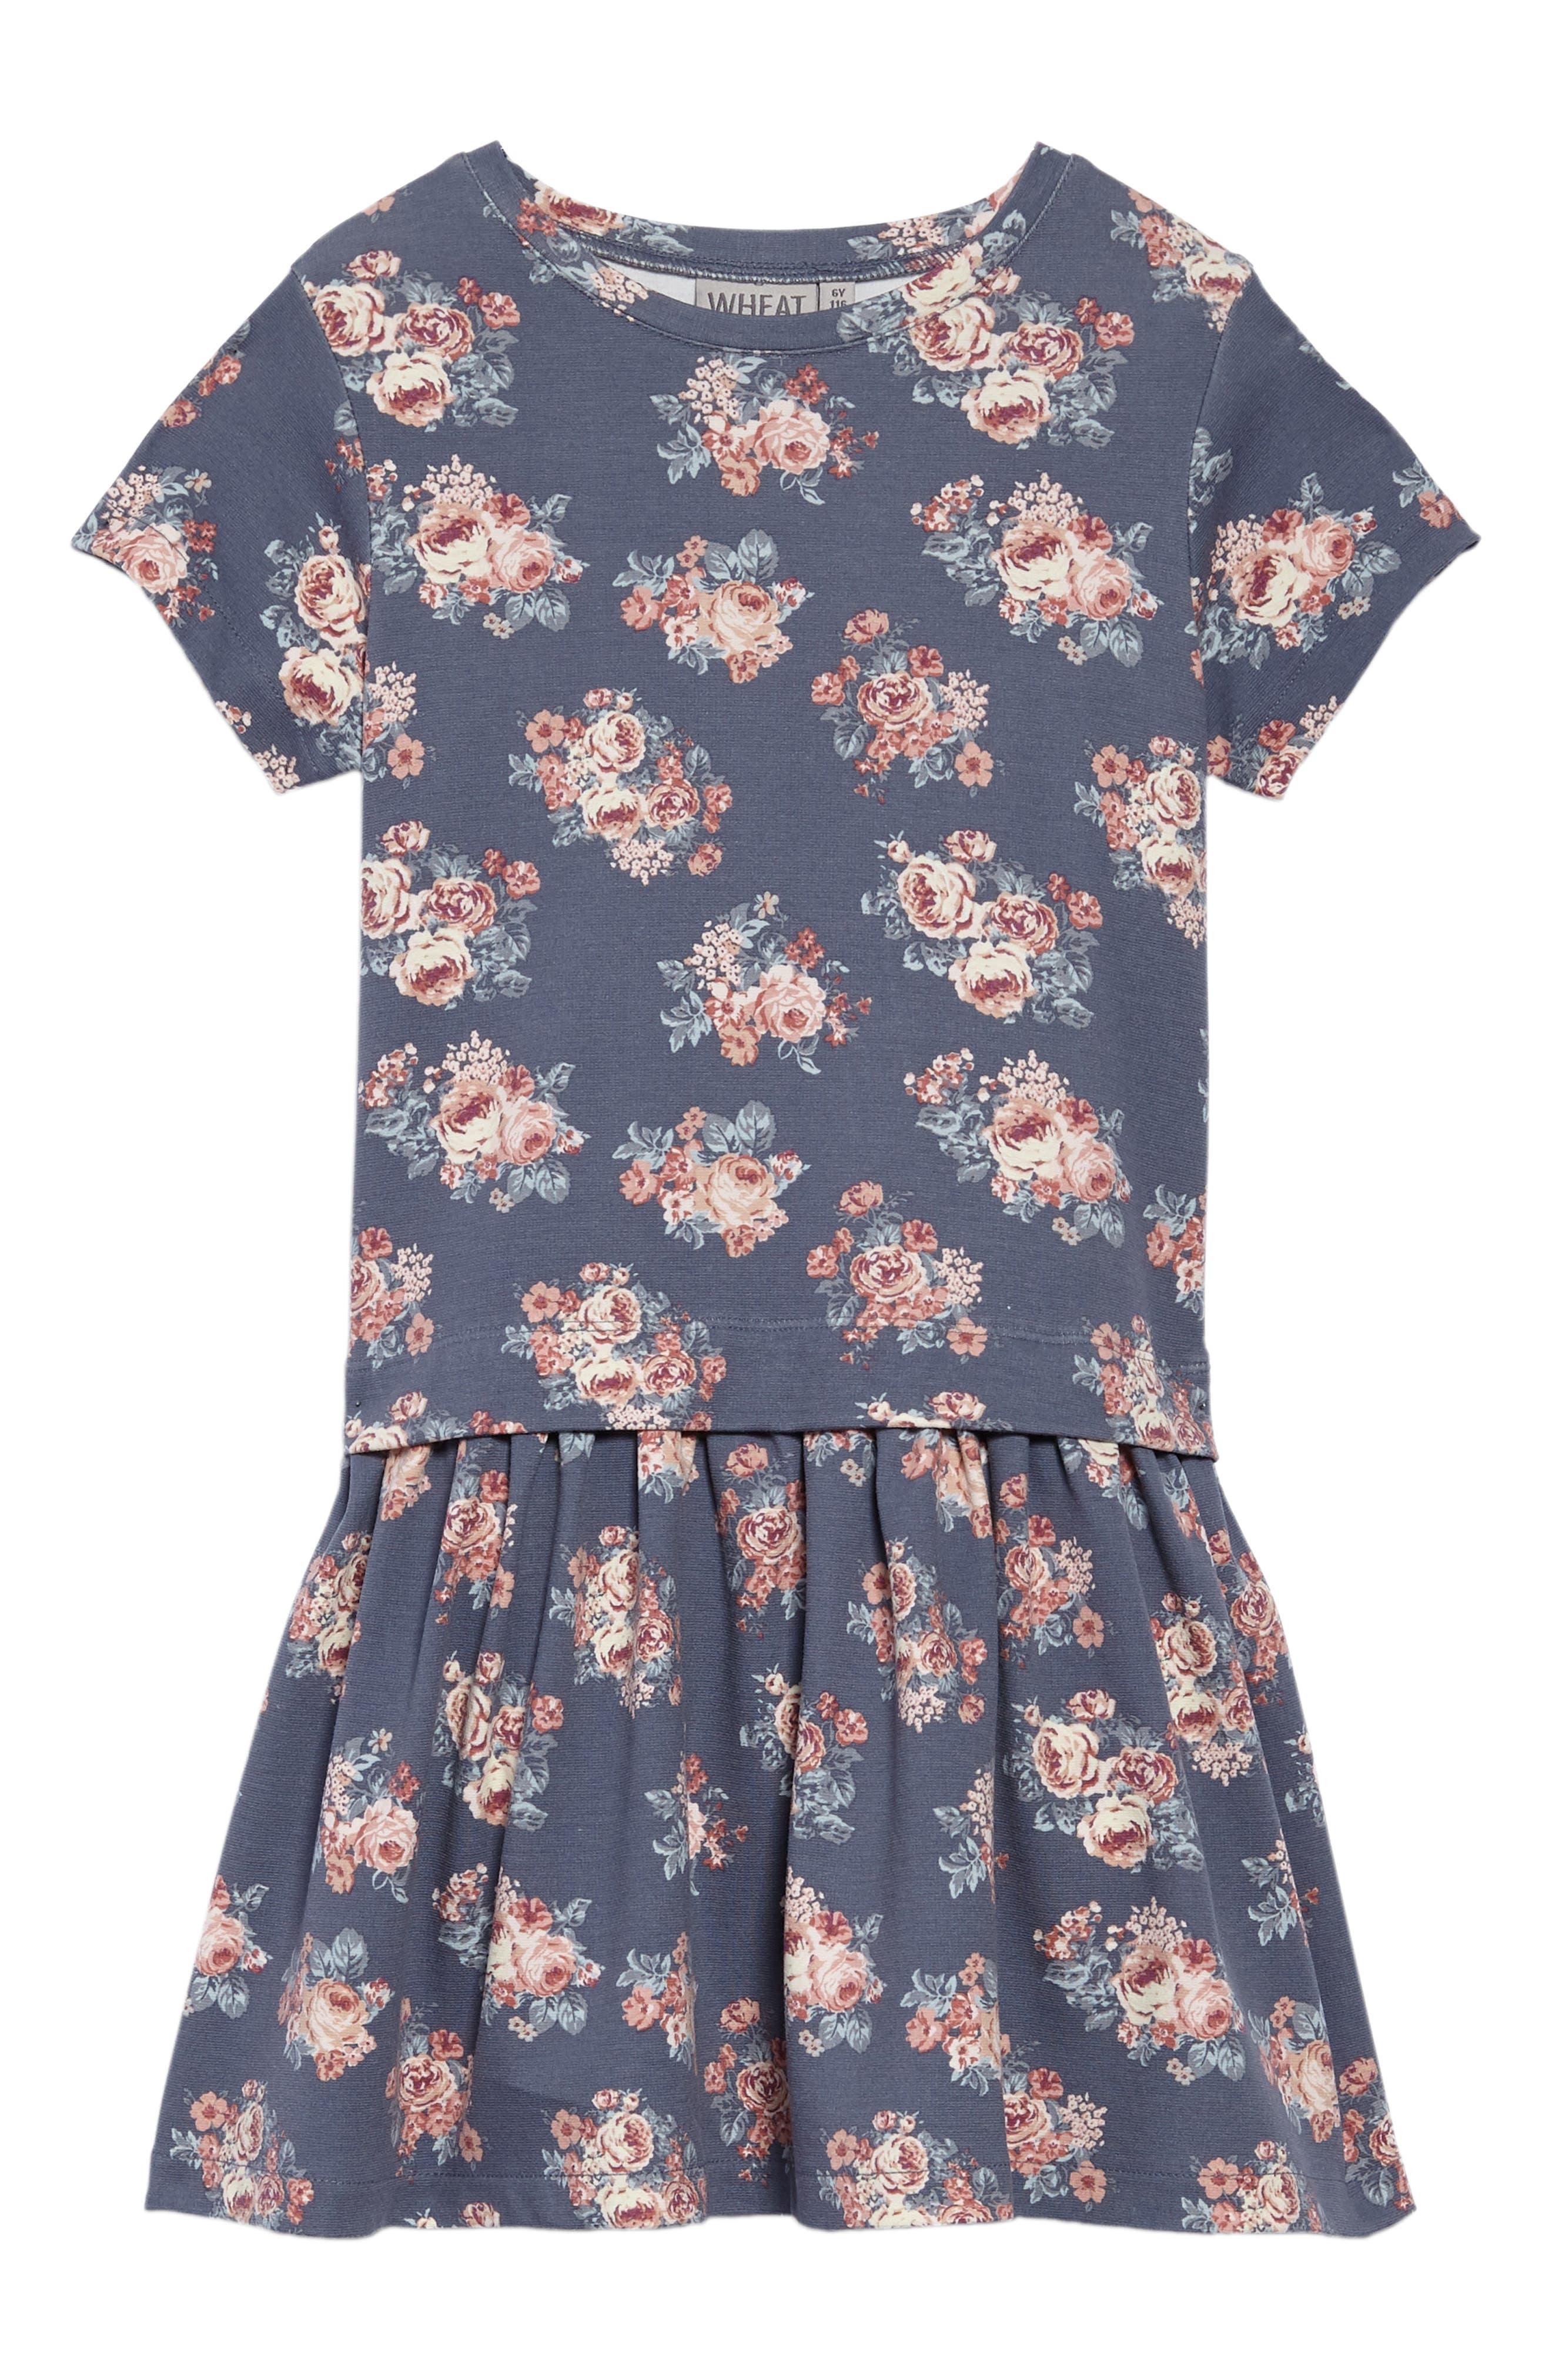 Michella Floral Print Dress,                         Main,                         color, 020